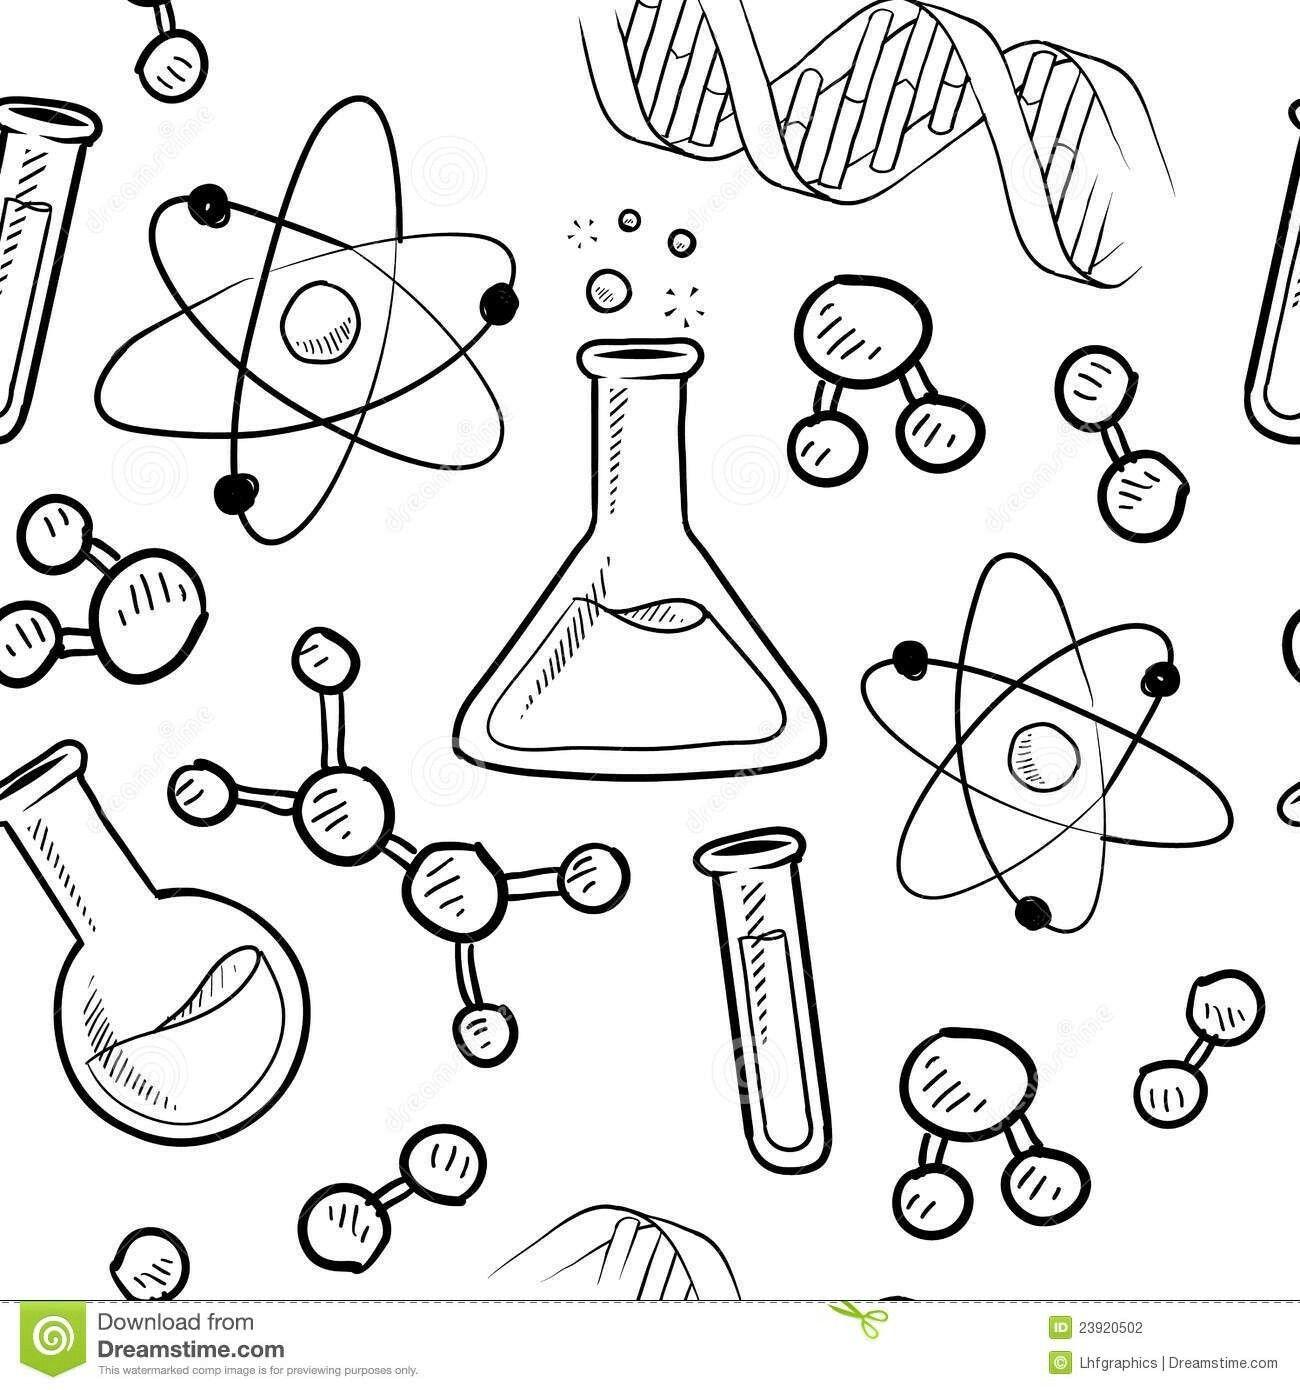 Pin De Caleb Whitefield Em Teacher Pot Head Desenhos De Quimica